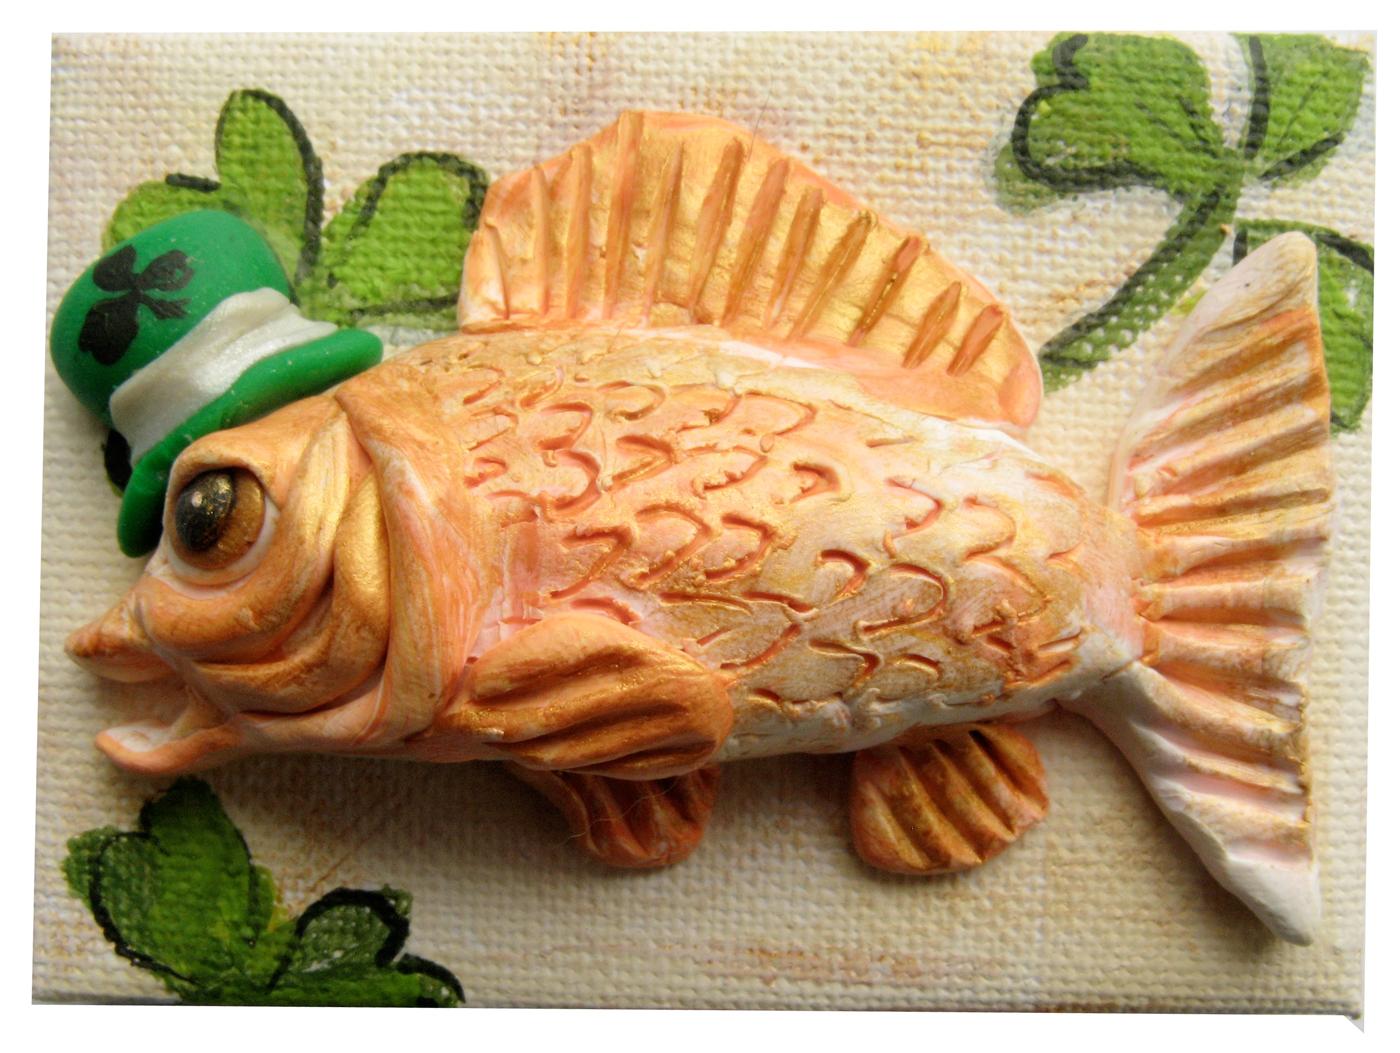 Alison_E_kurek_St._Patrick's_Day_Gold_Fish_1